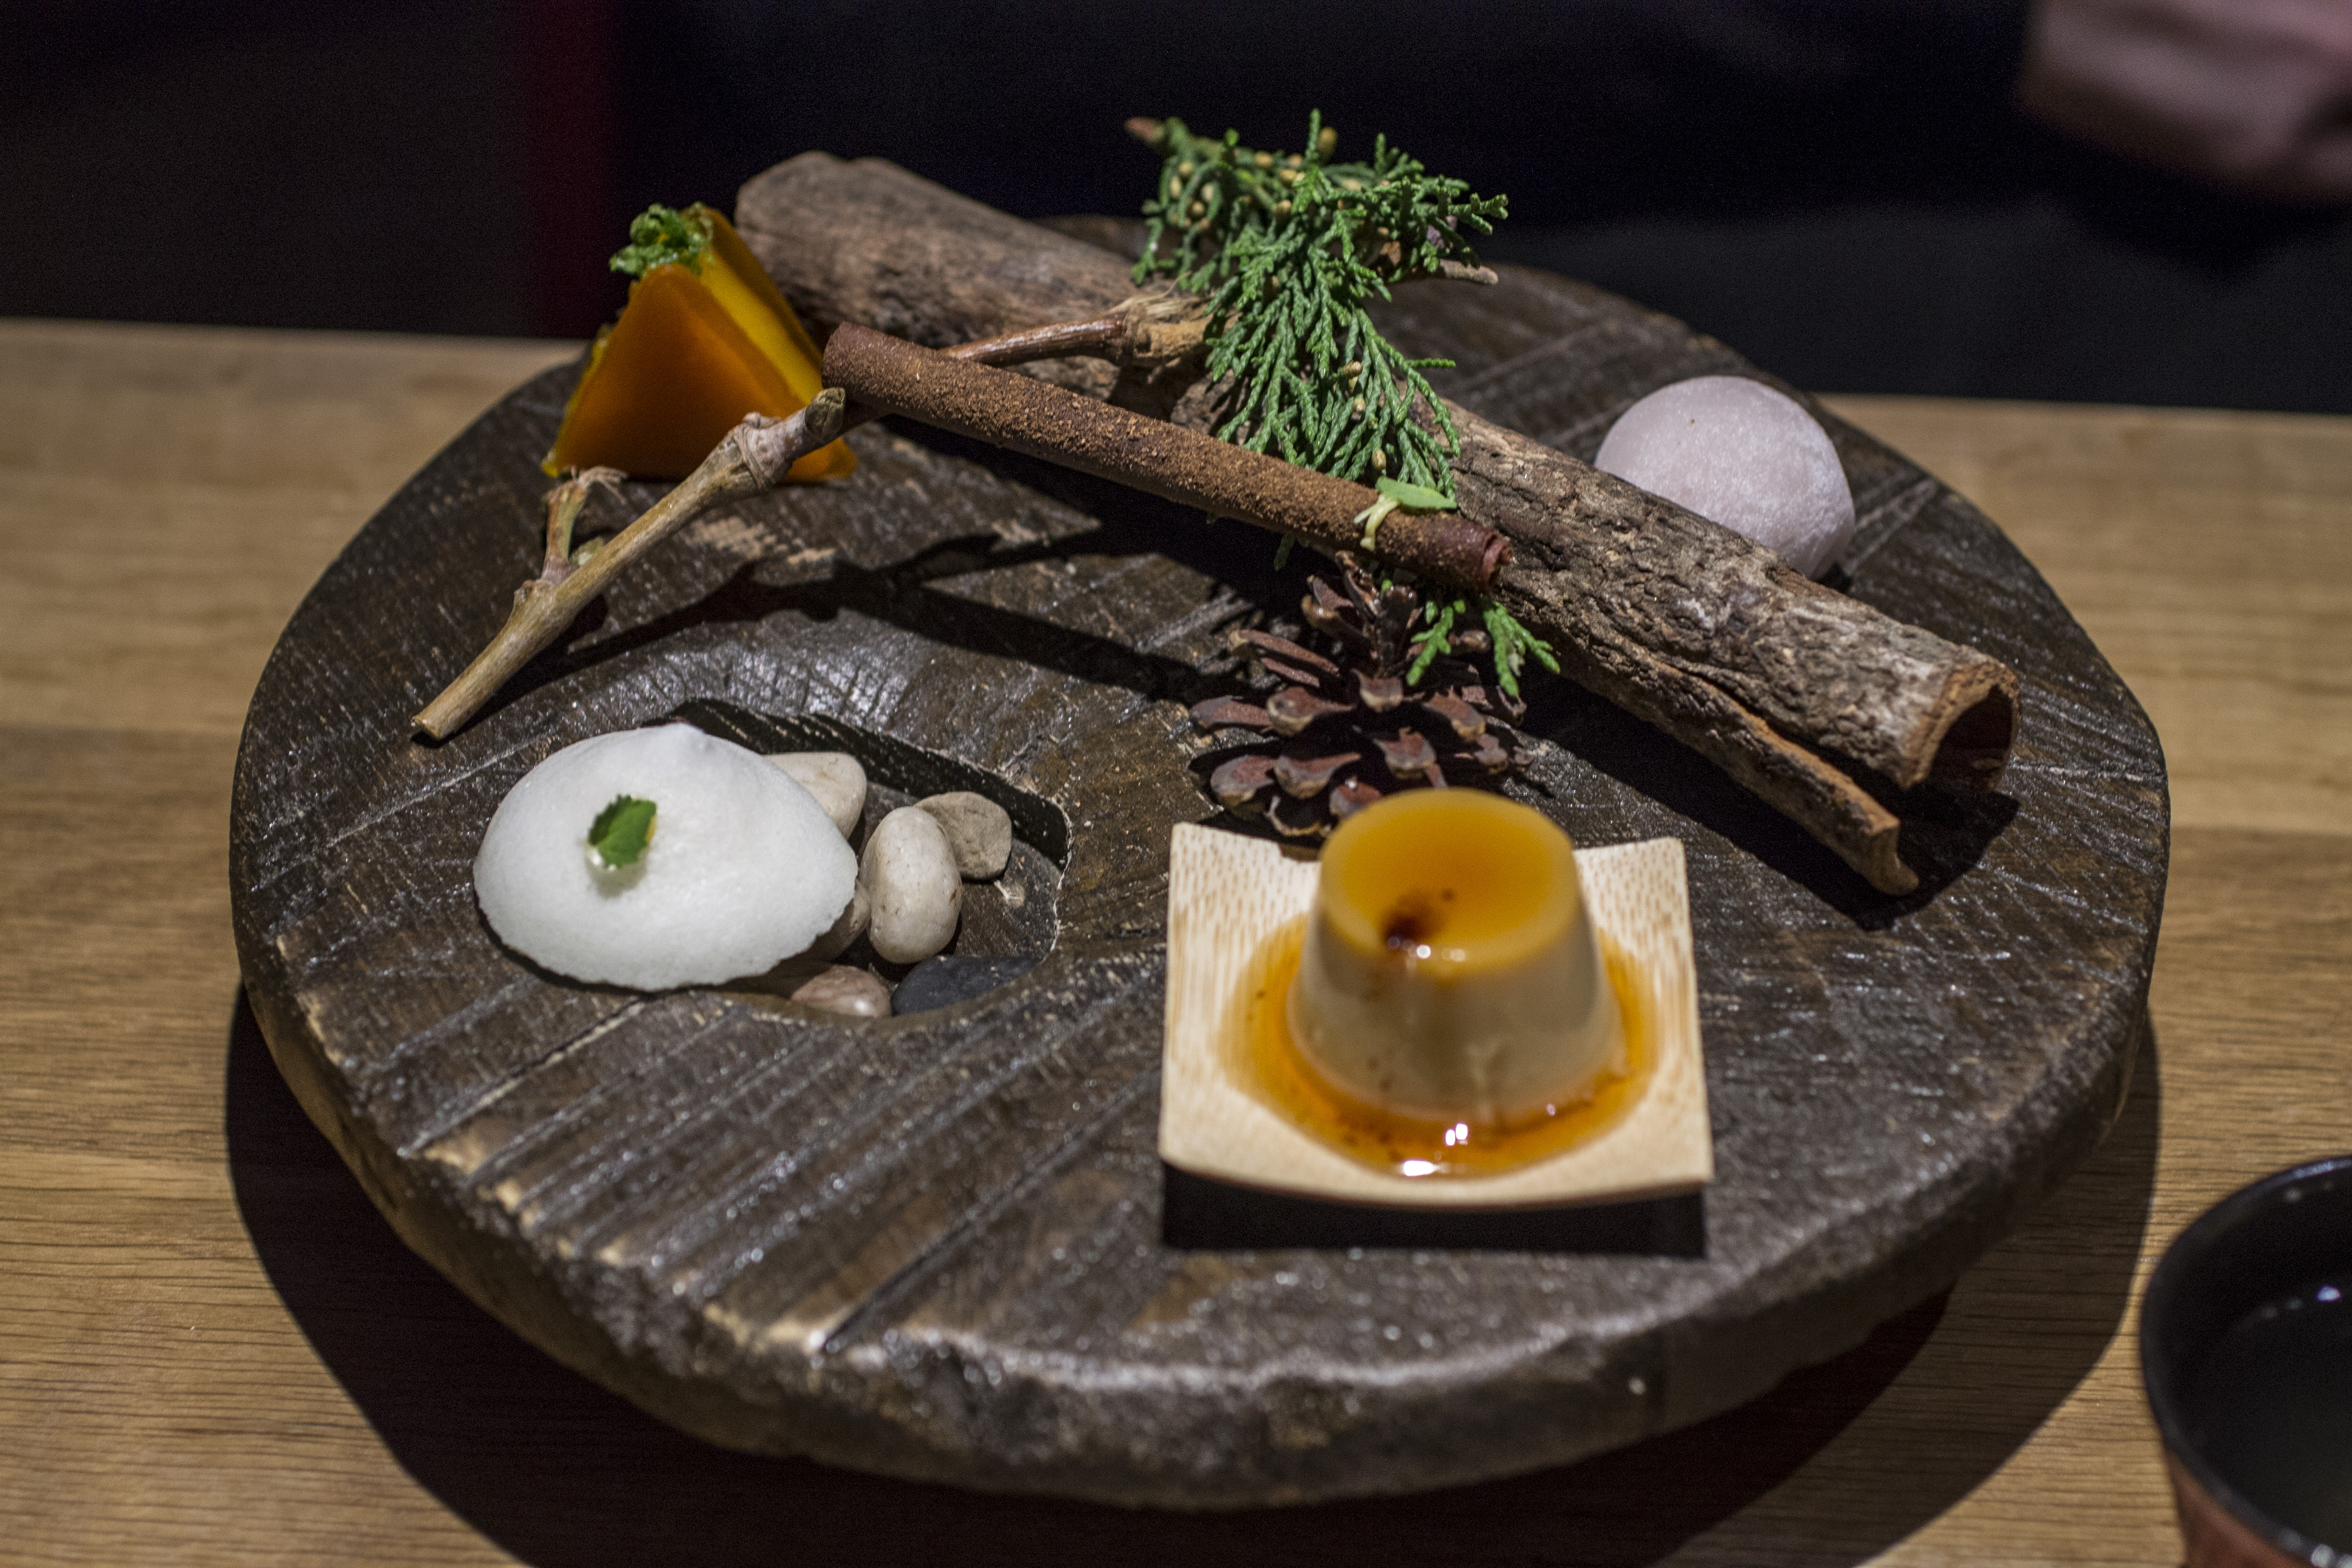 dessert, Pakta, Chef Albert Adrià, Kyoko li, Barcelona